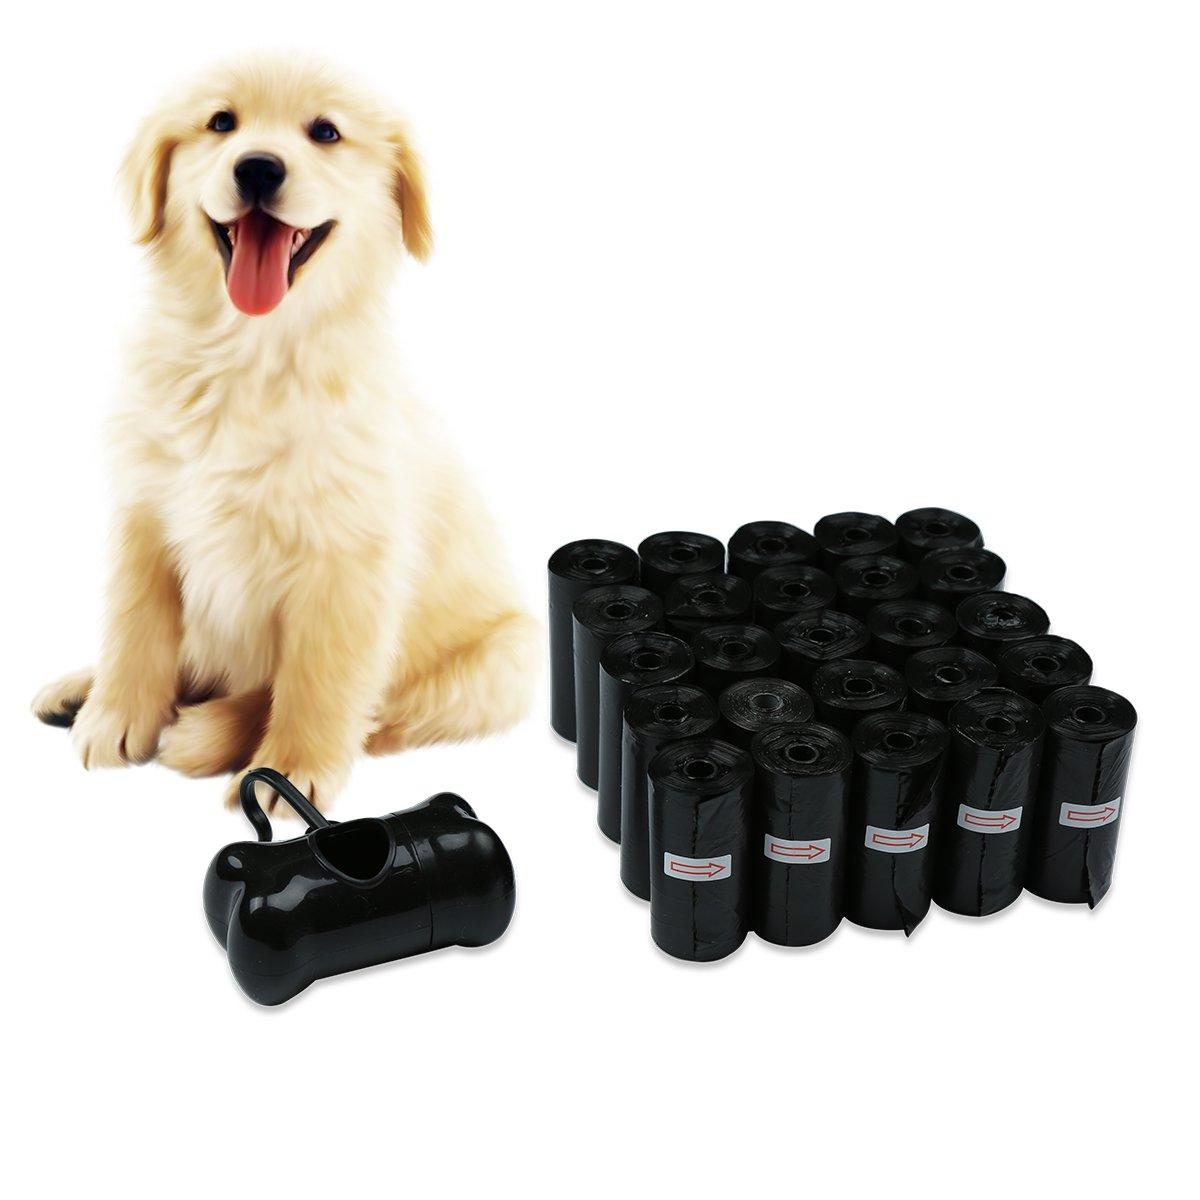 JKC Bolsas para residuos de Bolsas biodegradables Caca Caca de Perro Mascota Gran Negro Bolsa de desechos con dispensador y Conducir Clip Attachment Incluye ...